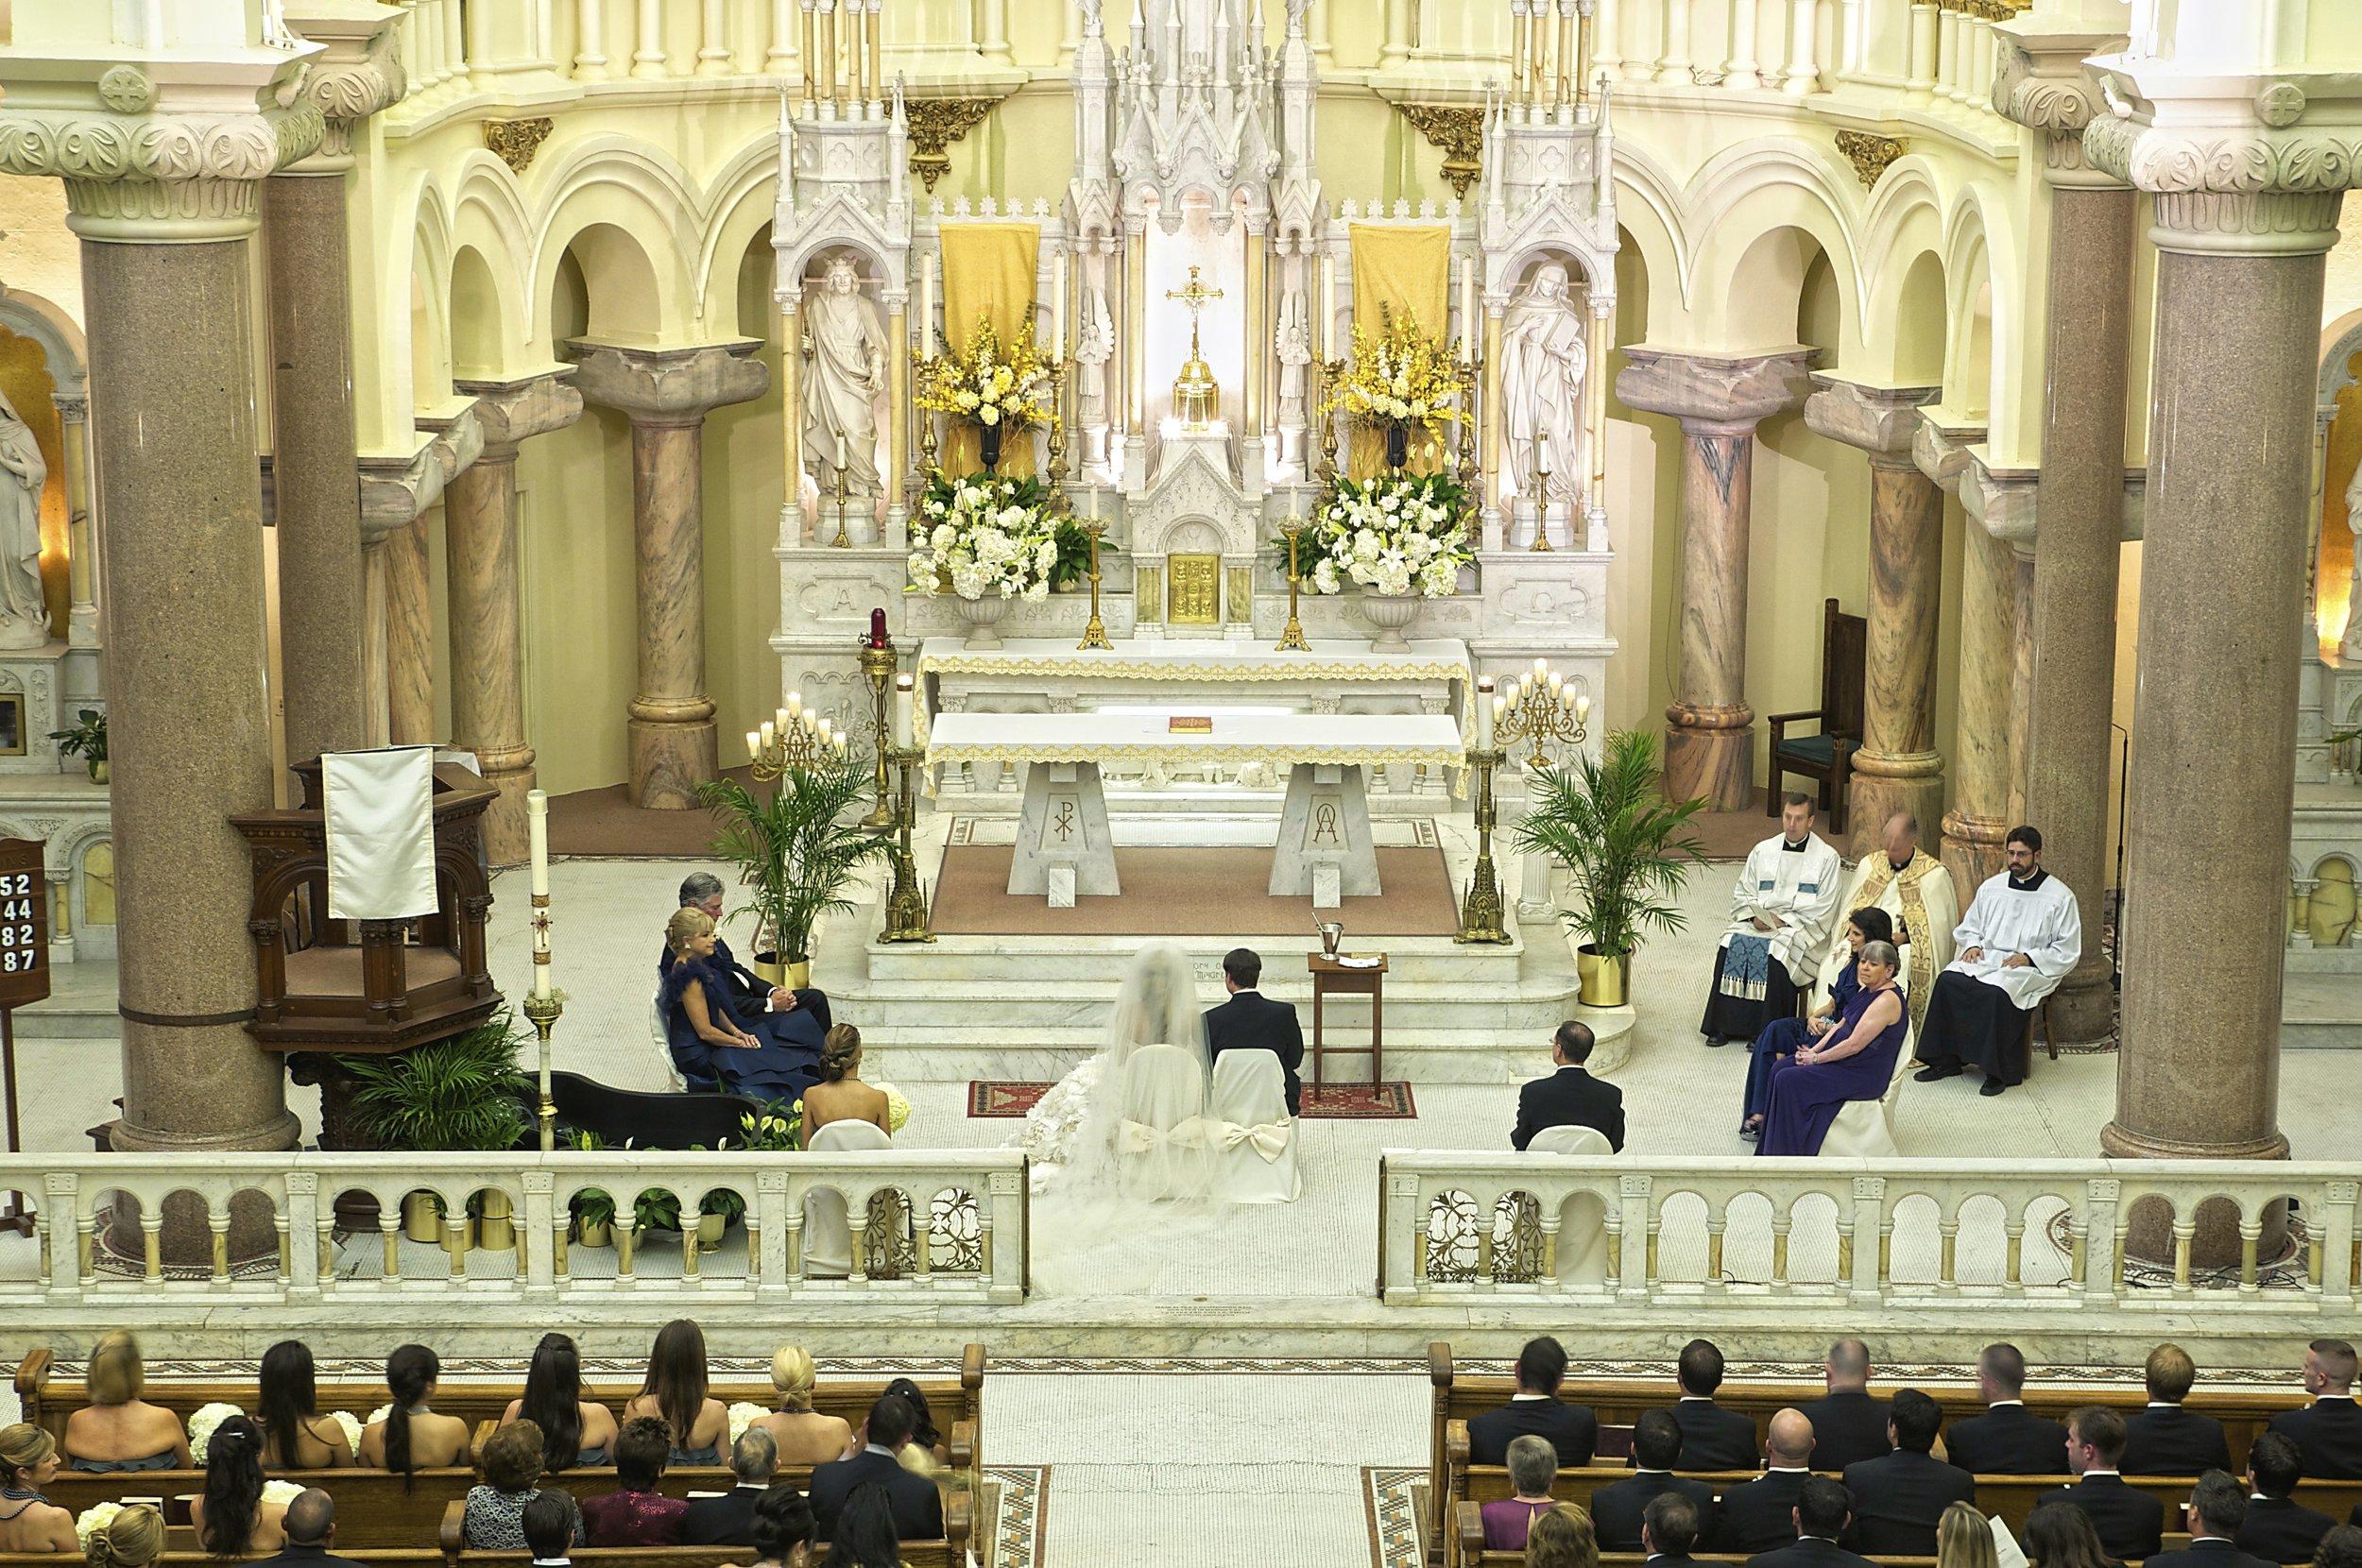 ryan-monica-5-14-2011-wedding-by-hilary-22410.jpg